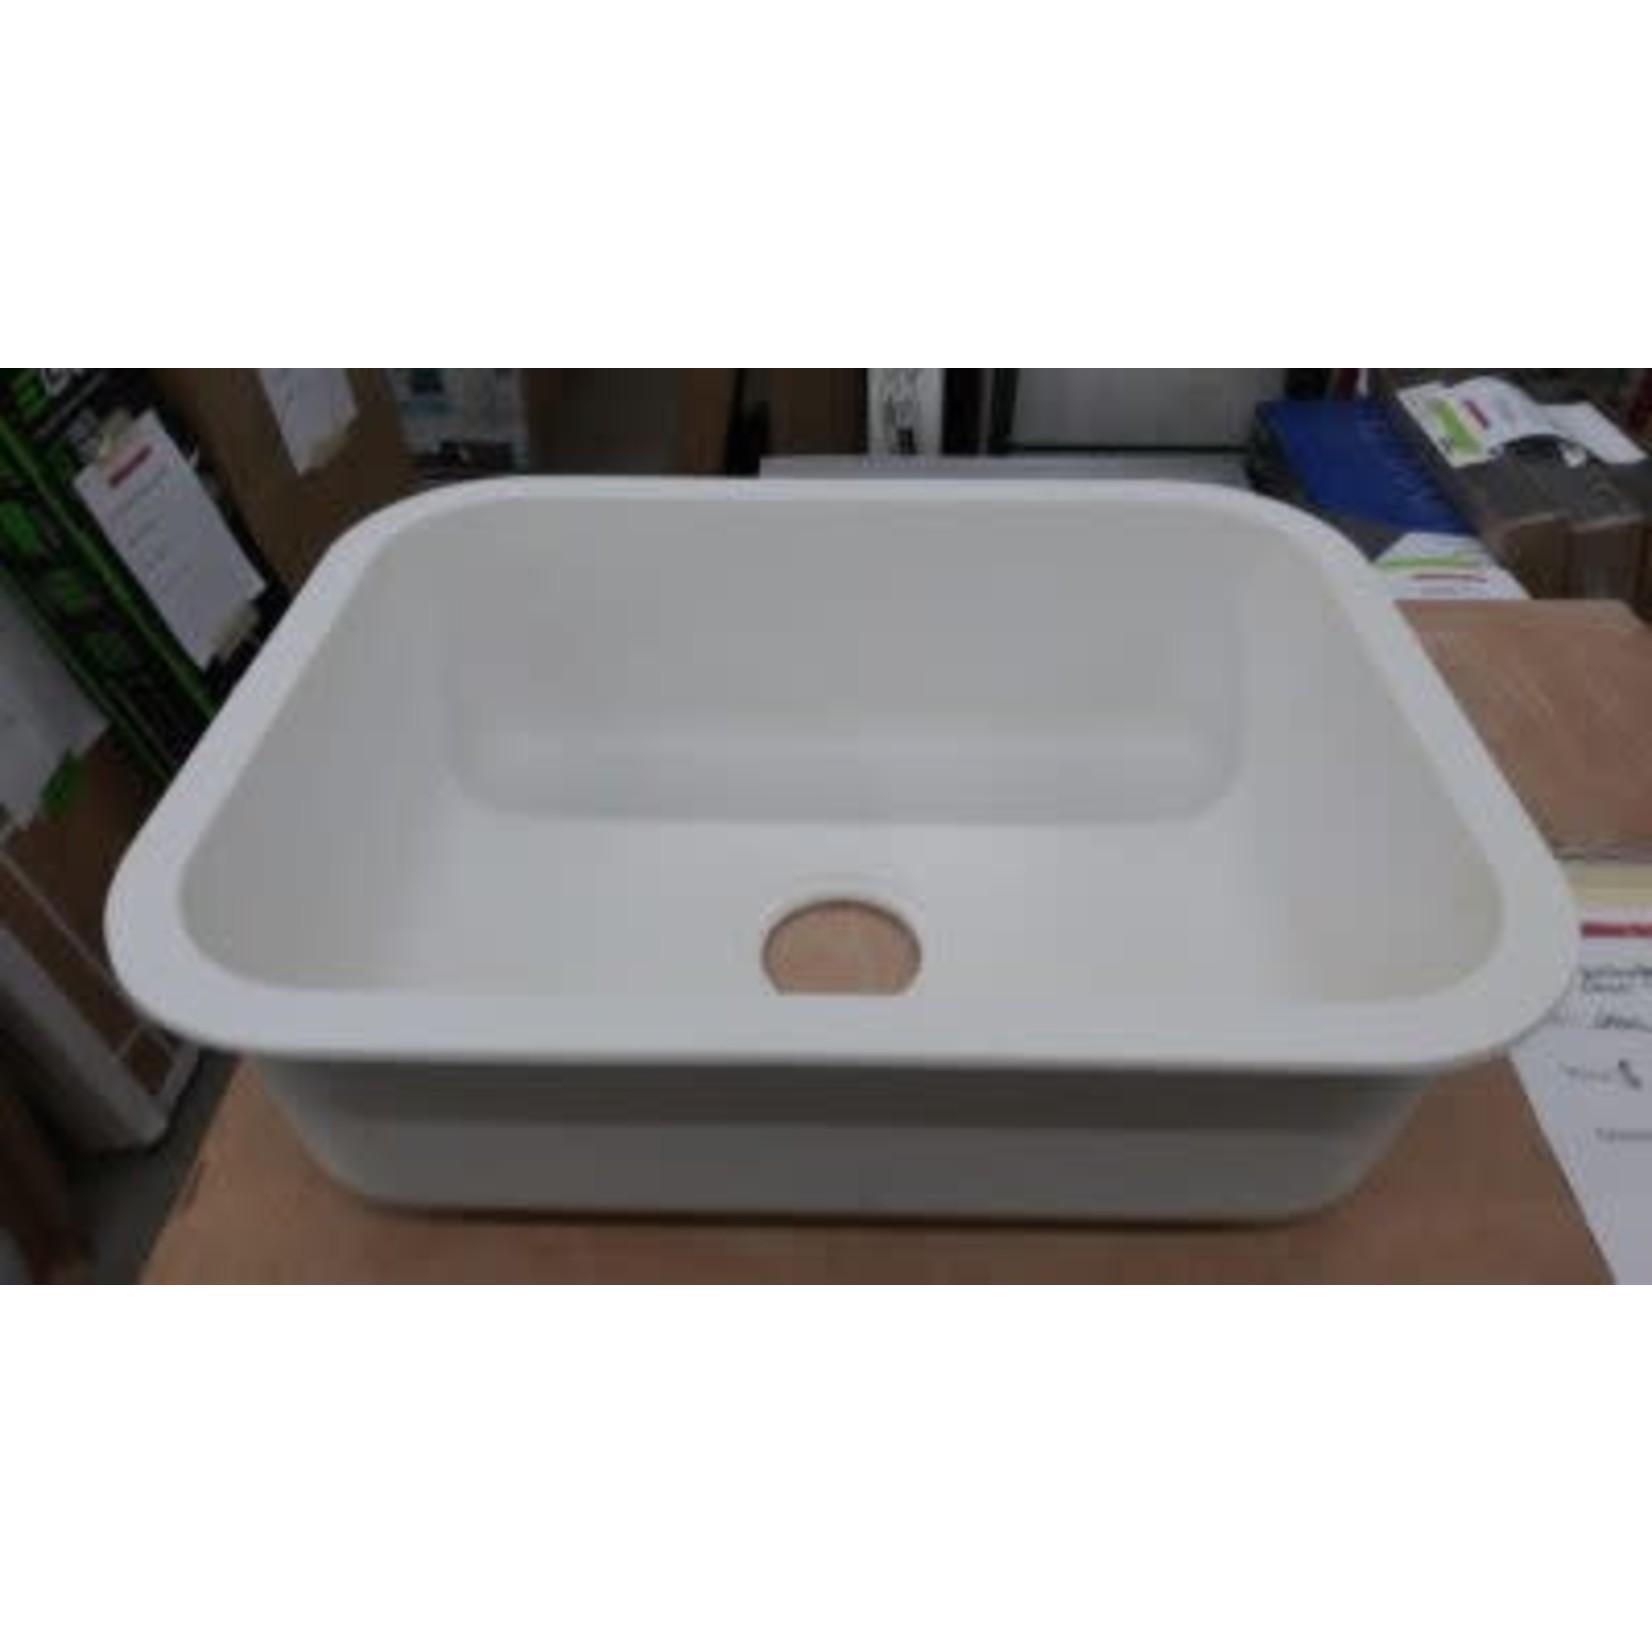 2802 DuPont Corian 871s Cameo White Single Drain Sink